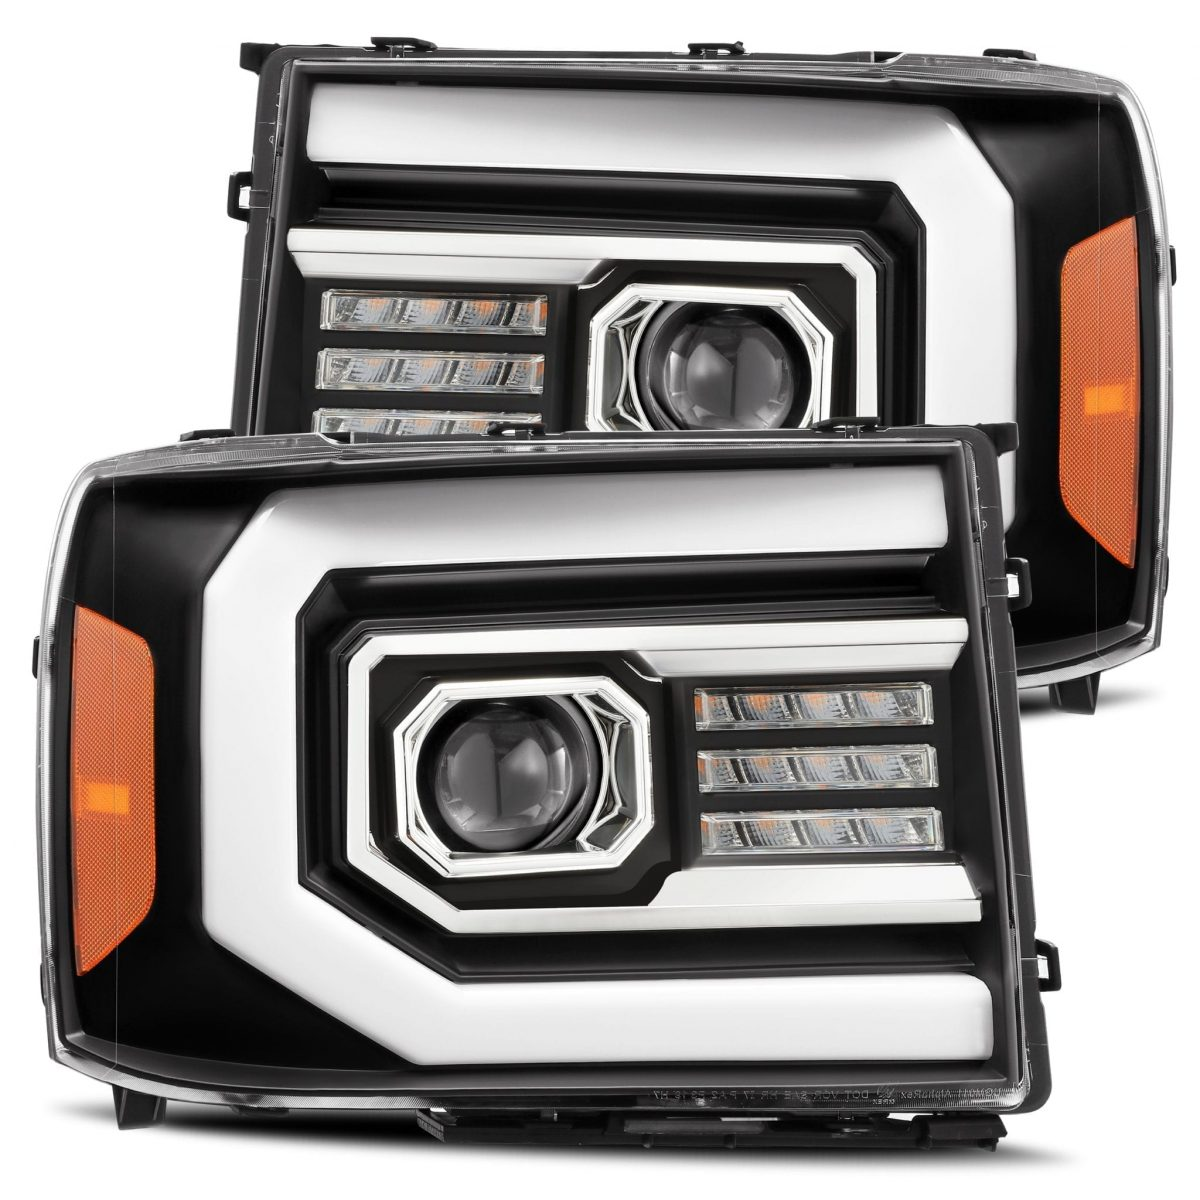 AlphaRex GMC Sierra 2007 2008 2009 2010 2011 2012 2013 PRO-Series Projector Headlights Black